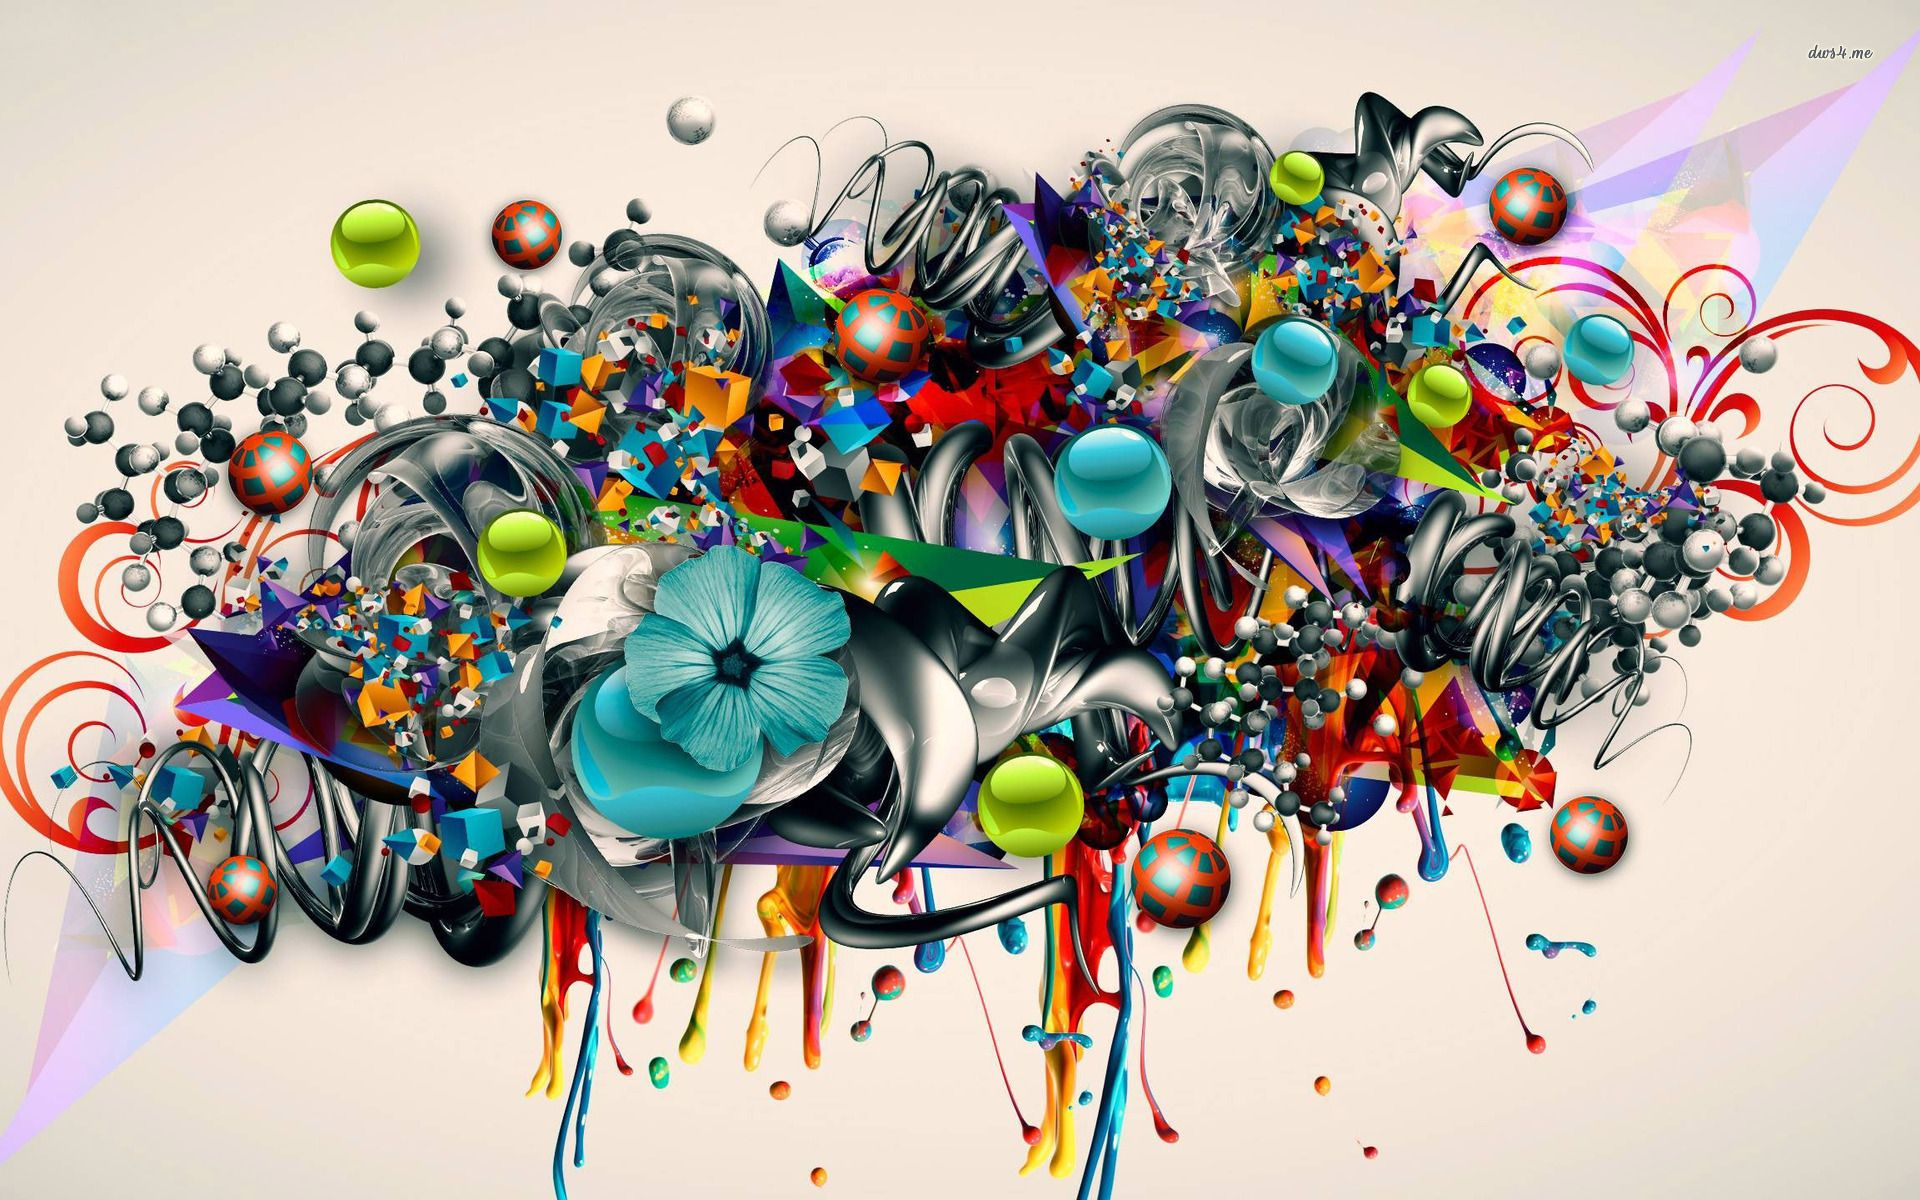 3d Graffiti Art Wallpapers Background For Desktop